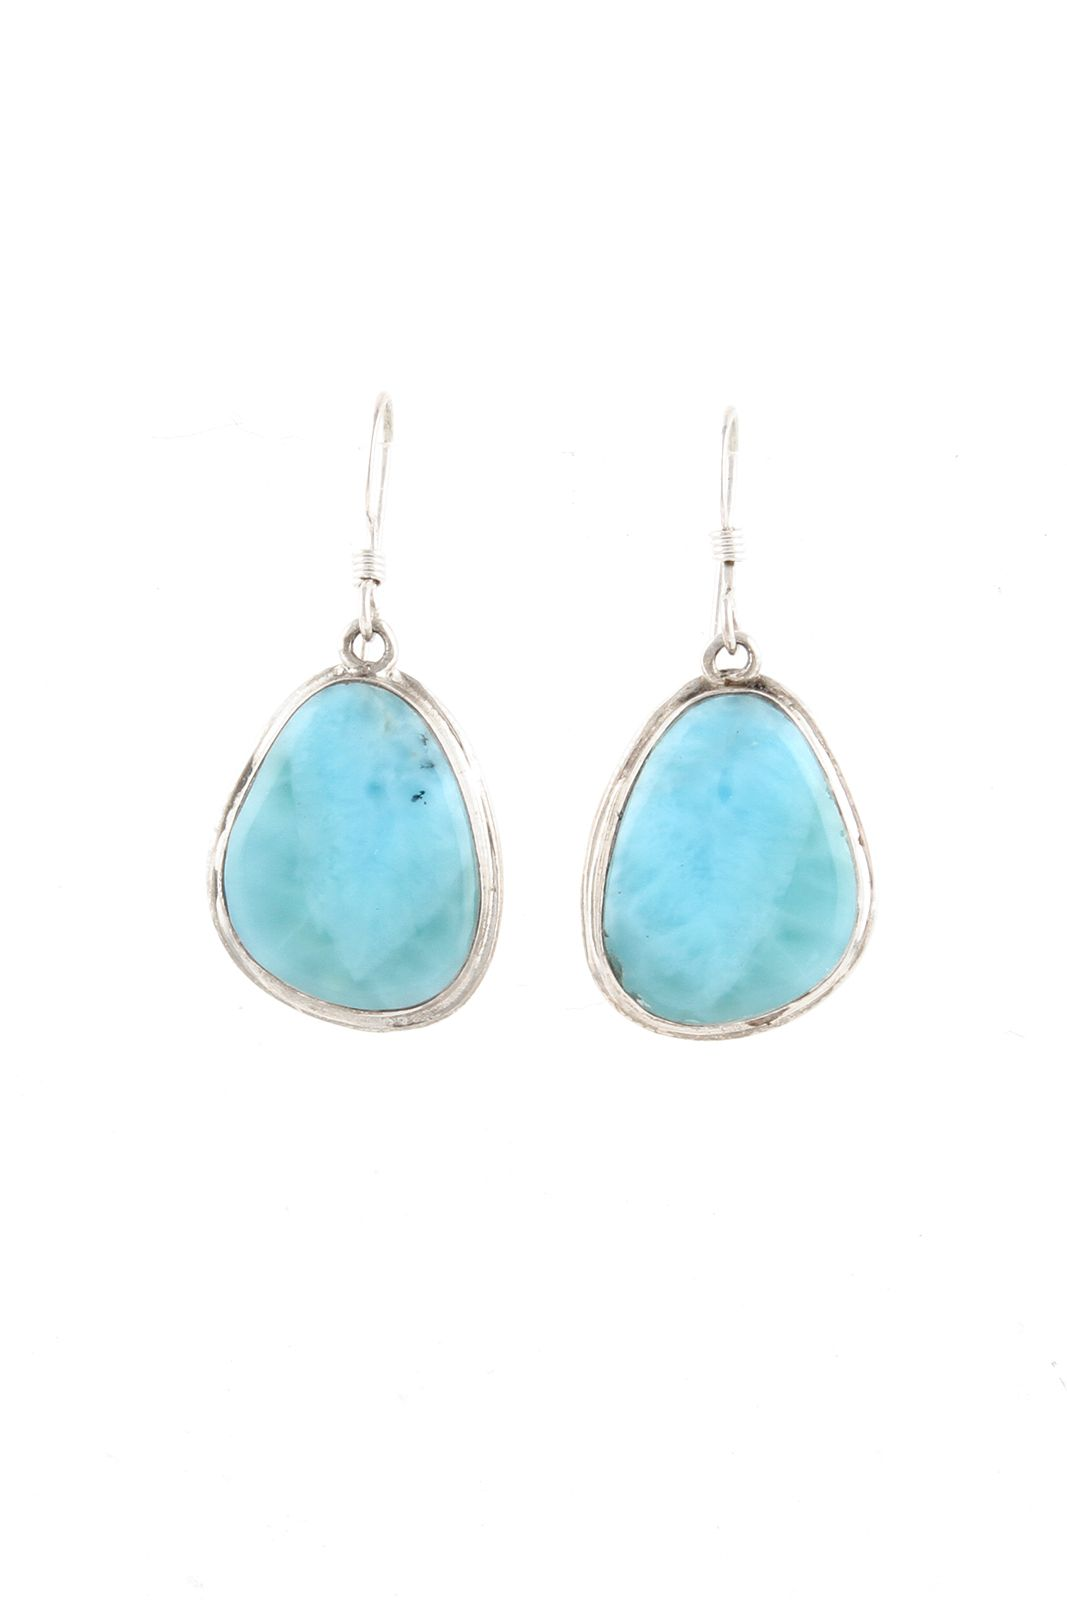 Navajo Sterling Silver Larimar Earrings | Dominican republic ...